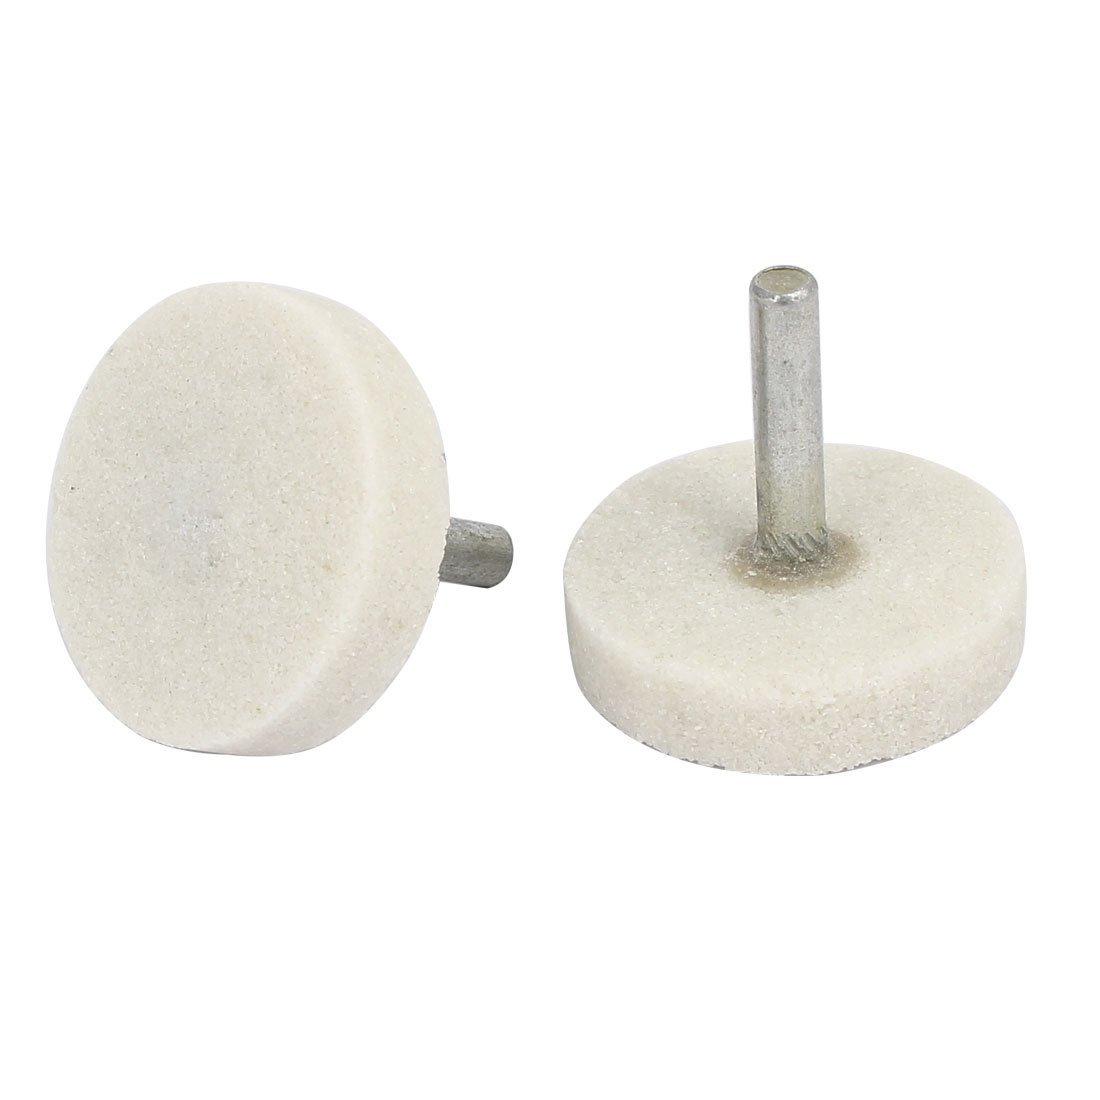 Amazon.com: DealMux 6 milímetros Shank 40 milímetros Chefe Dia T Tipo Mandril Montado 6pcs Grinding ponto branco: Automotive